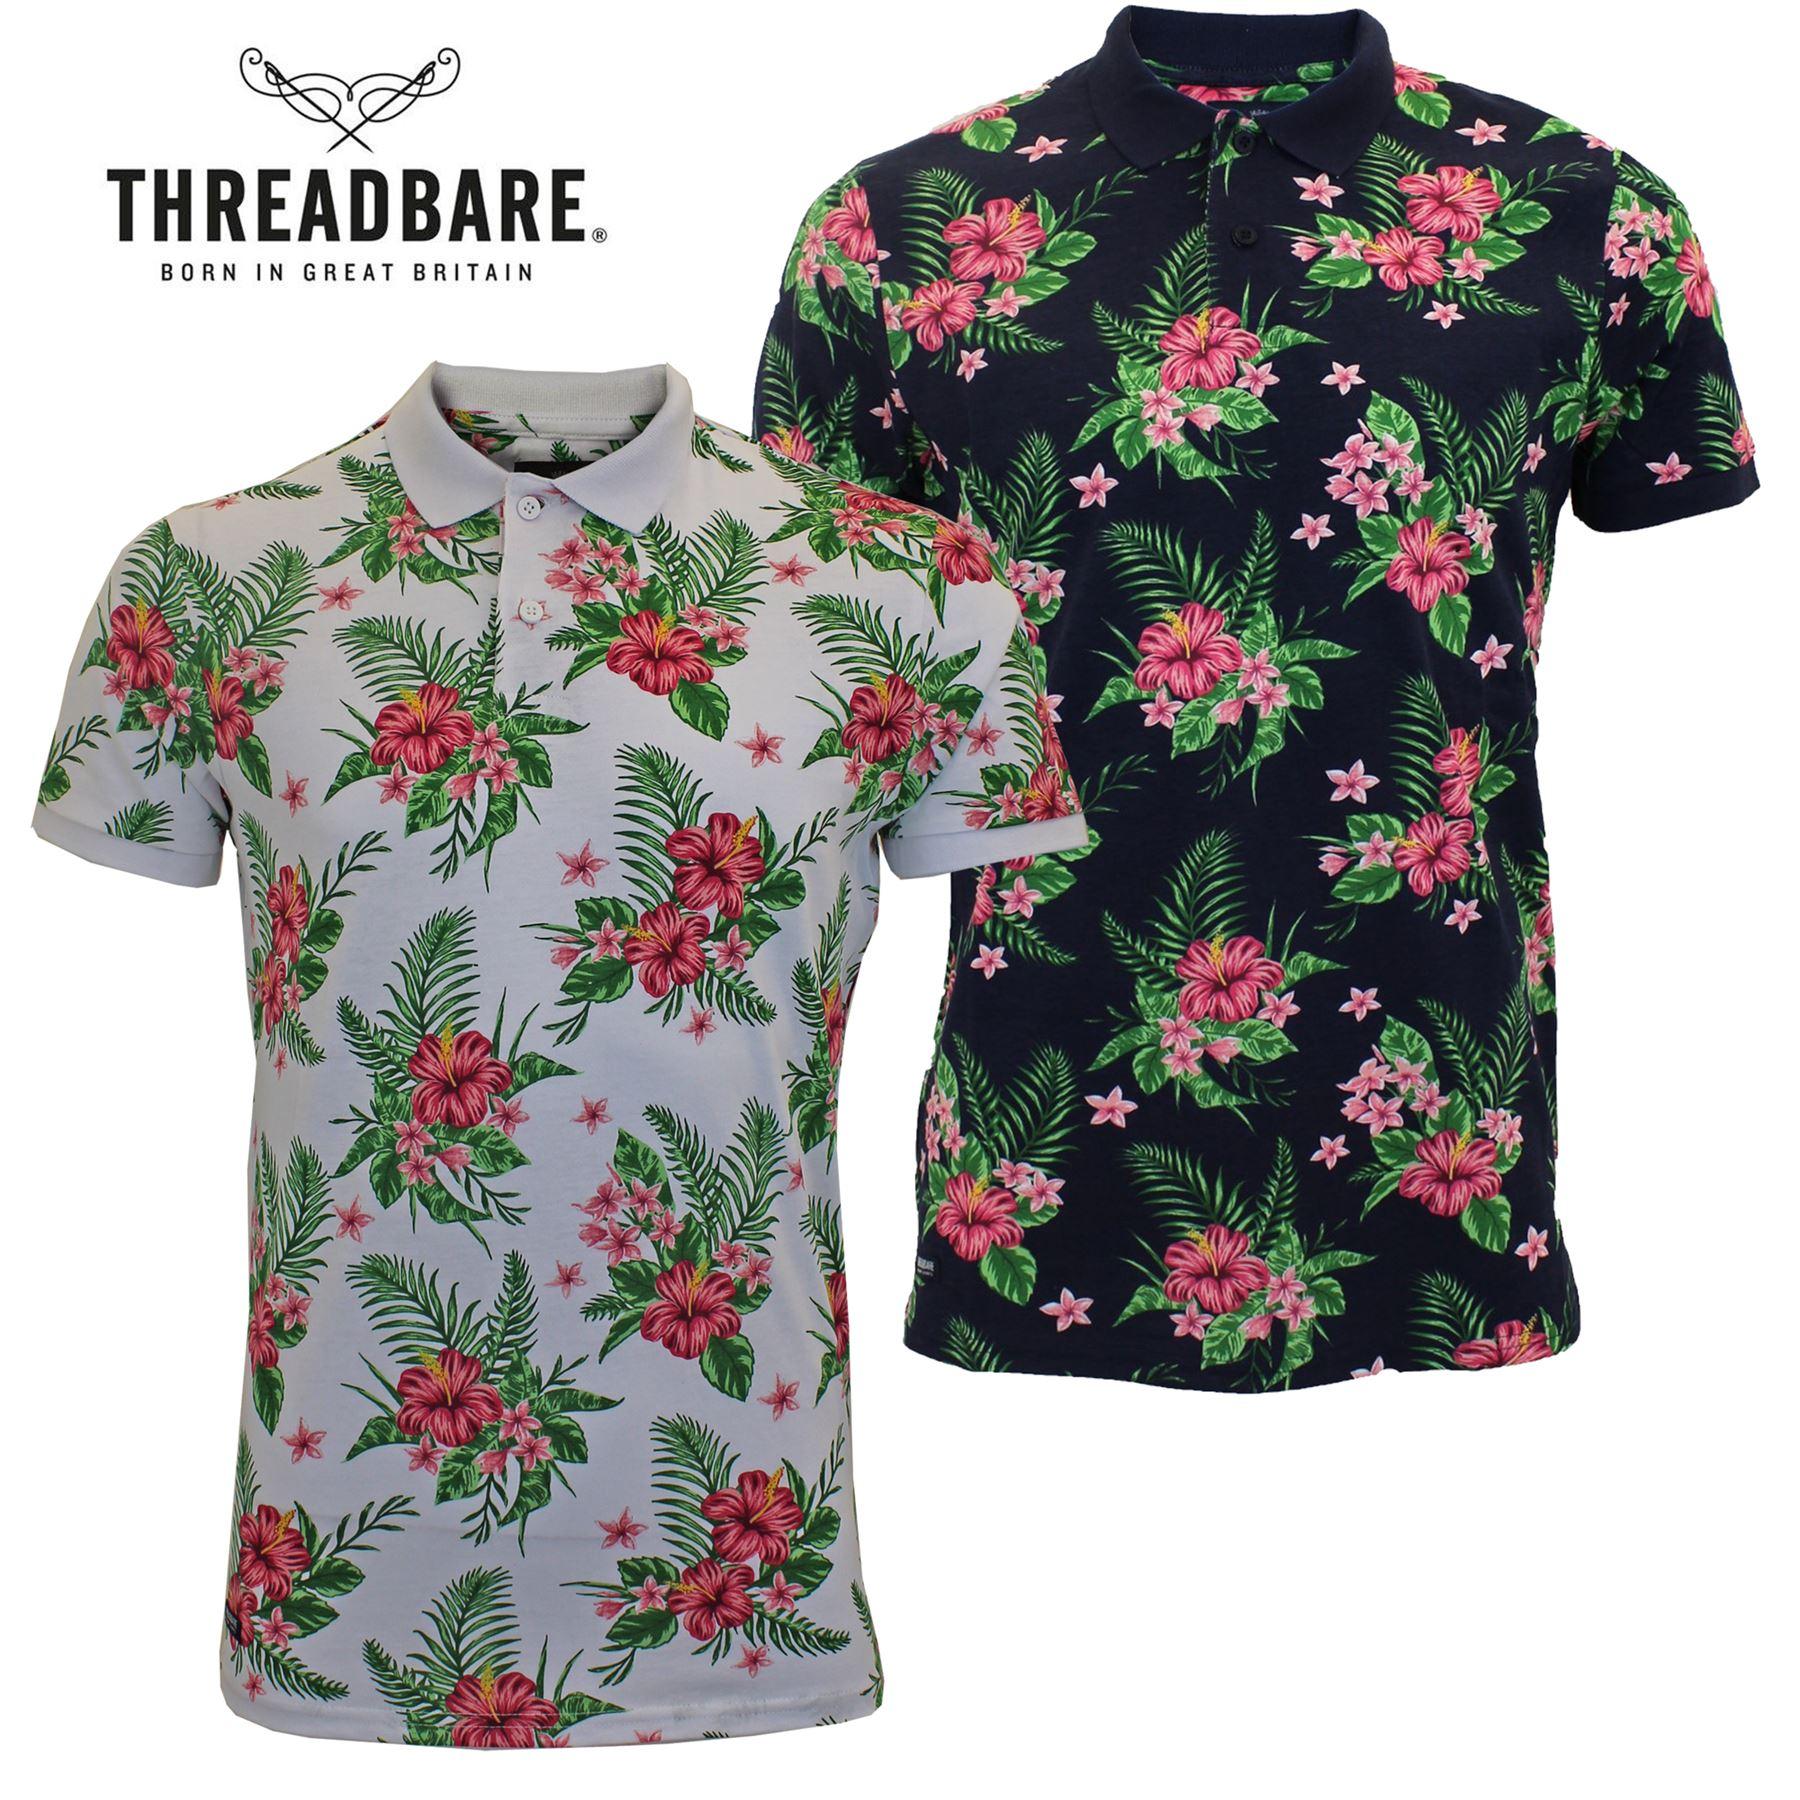 0a3a4d60b5f Mens Threadbare Short Sleeve Cuffed Floral Polo Shirt 100% Cotton Summer T- Shirt